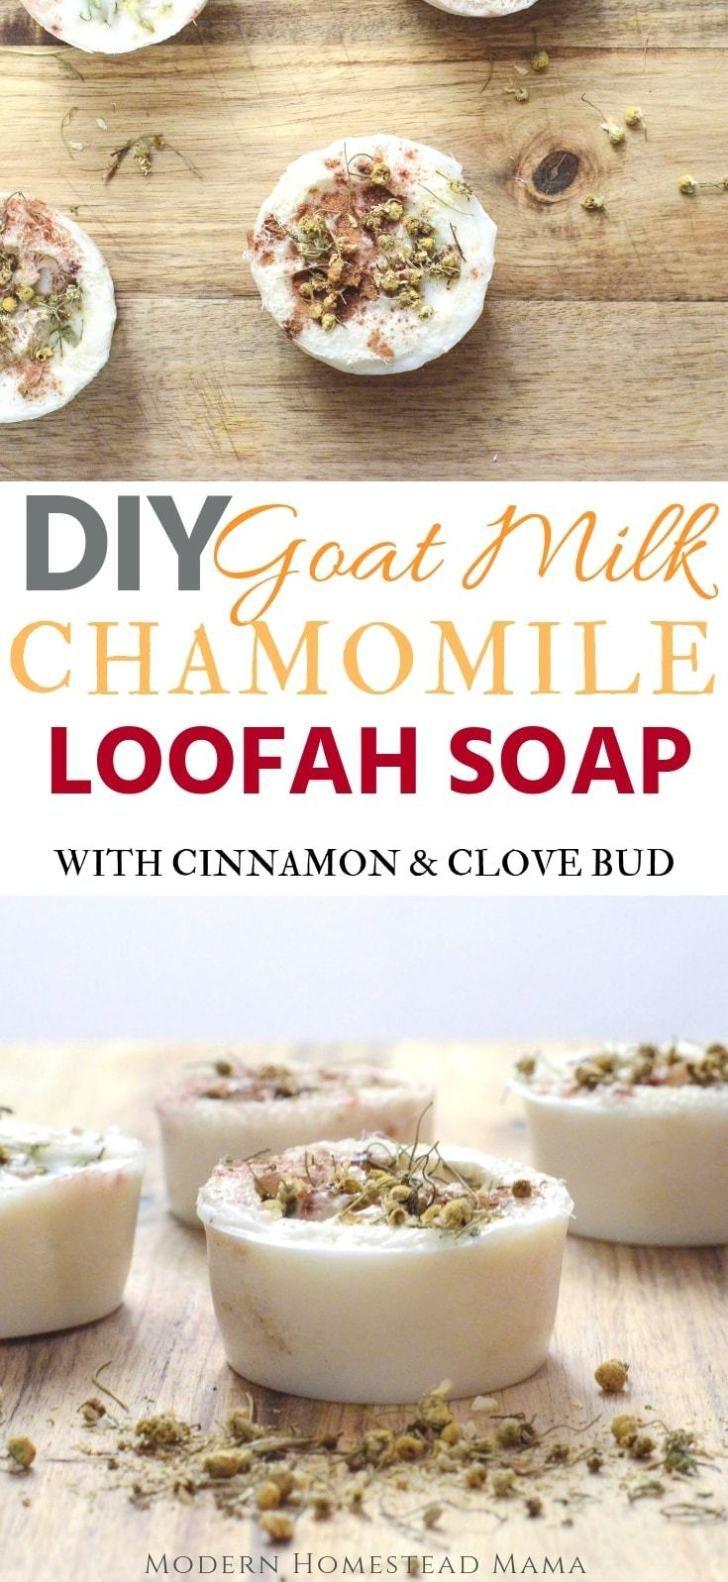 DIY goat's milk chamomile loofah soap   – Muddy creek goats